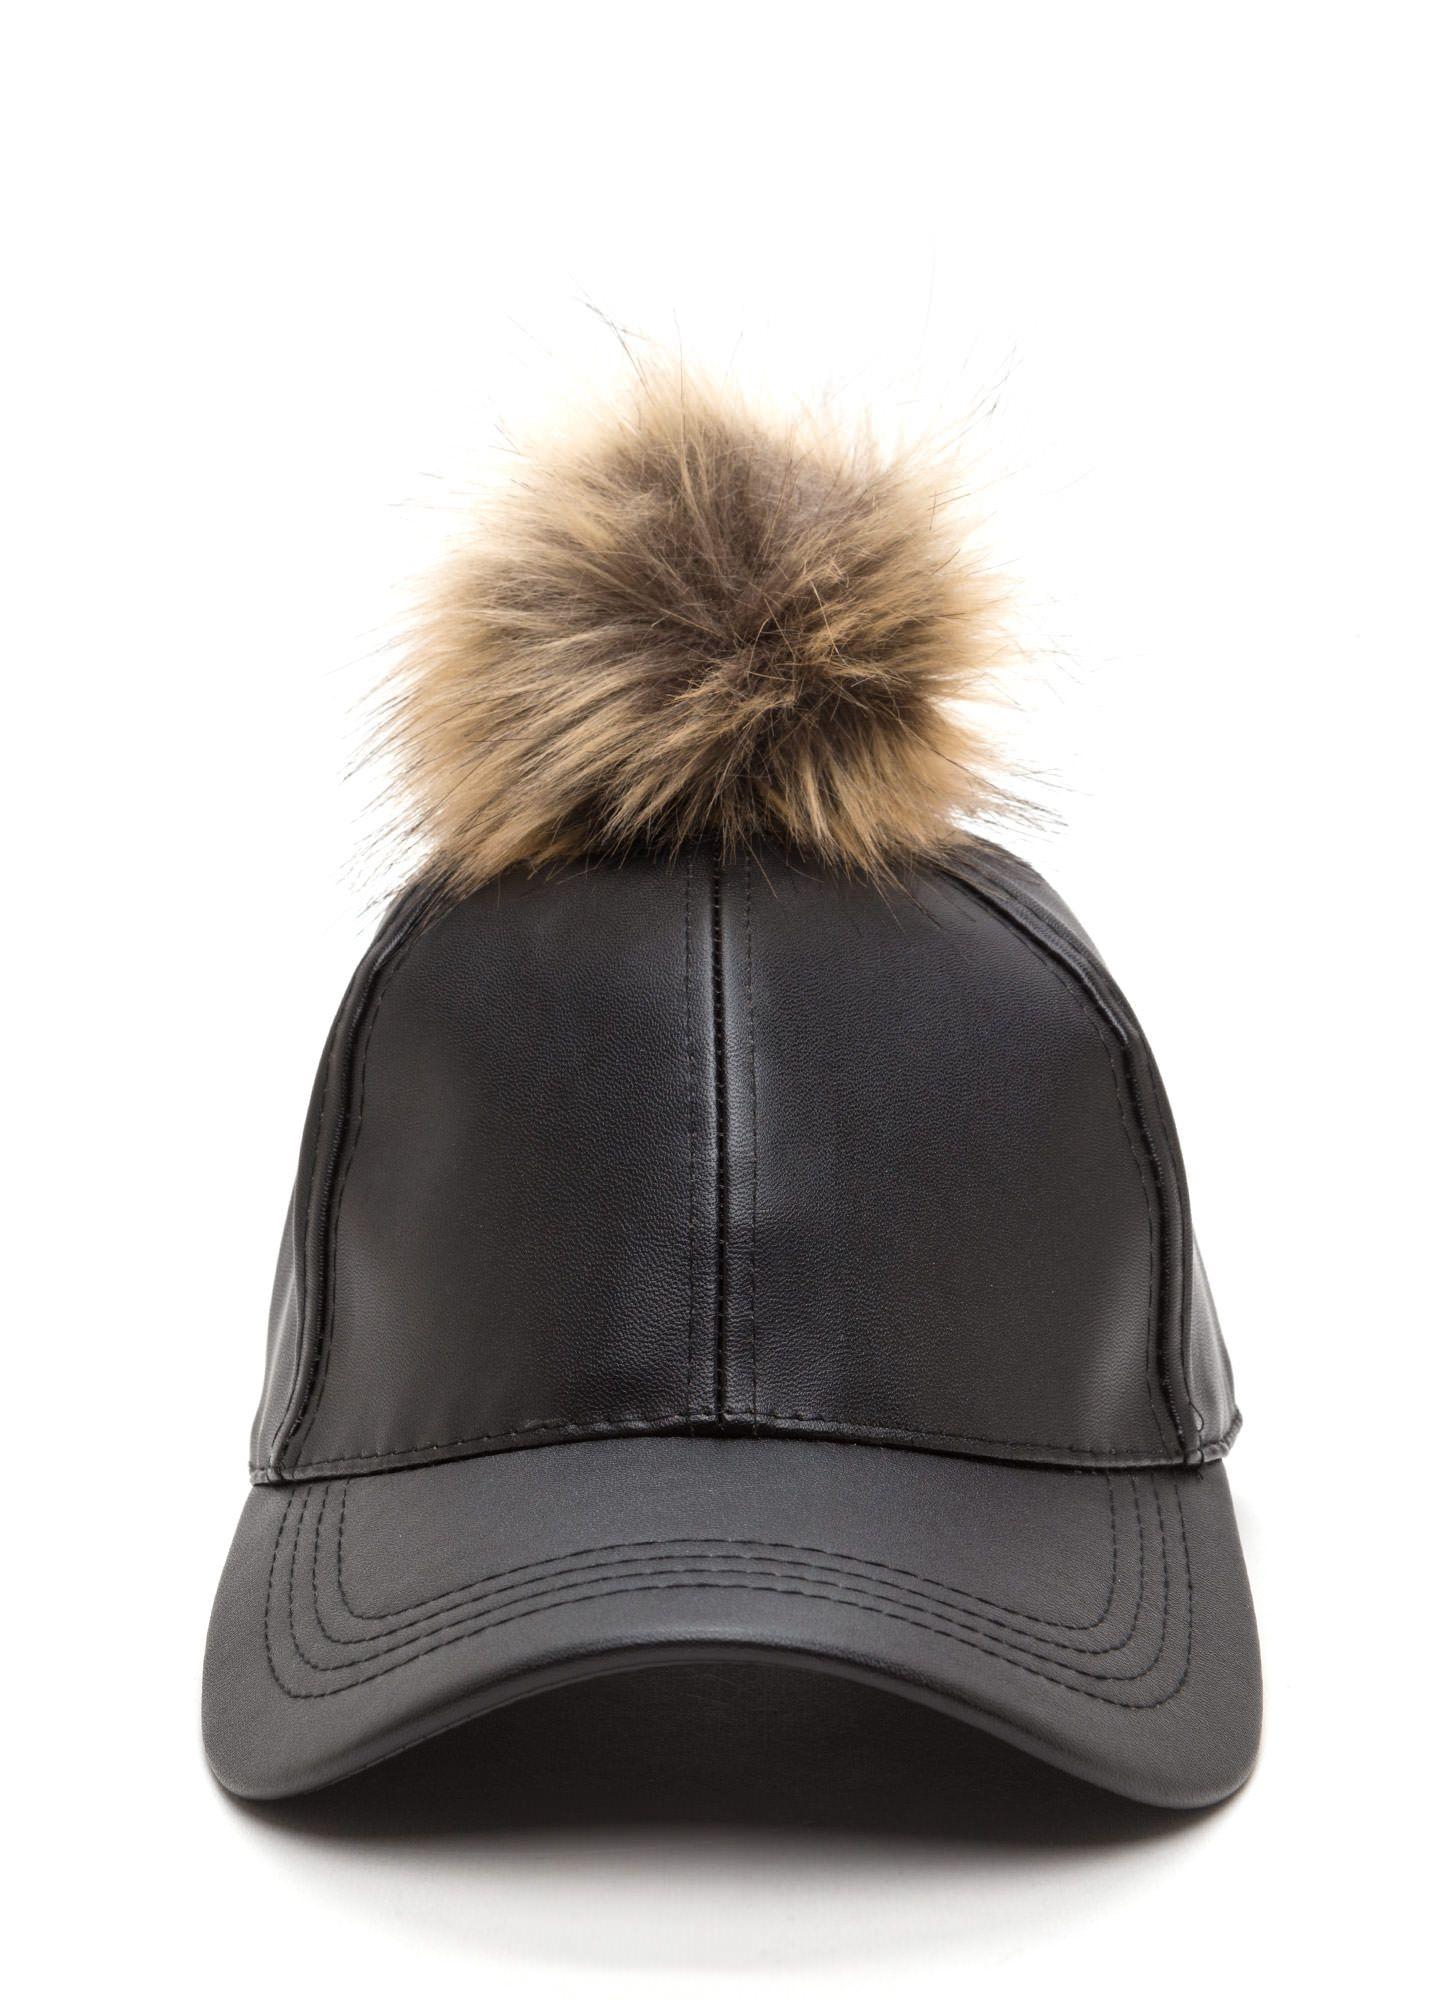 2c89a25bc93 Go Fur It Faux Leather Pom-Pom Cap BLACKBROWN IVORY MINT PINK - GoJane.com